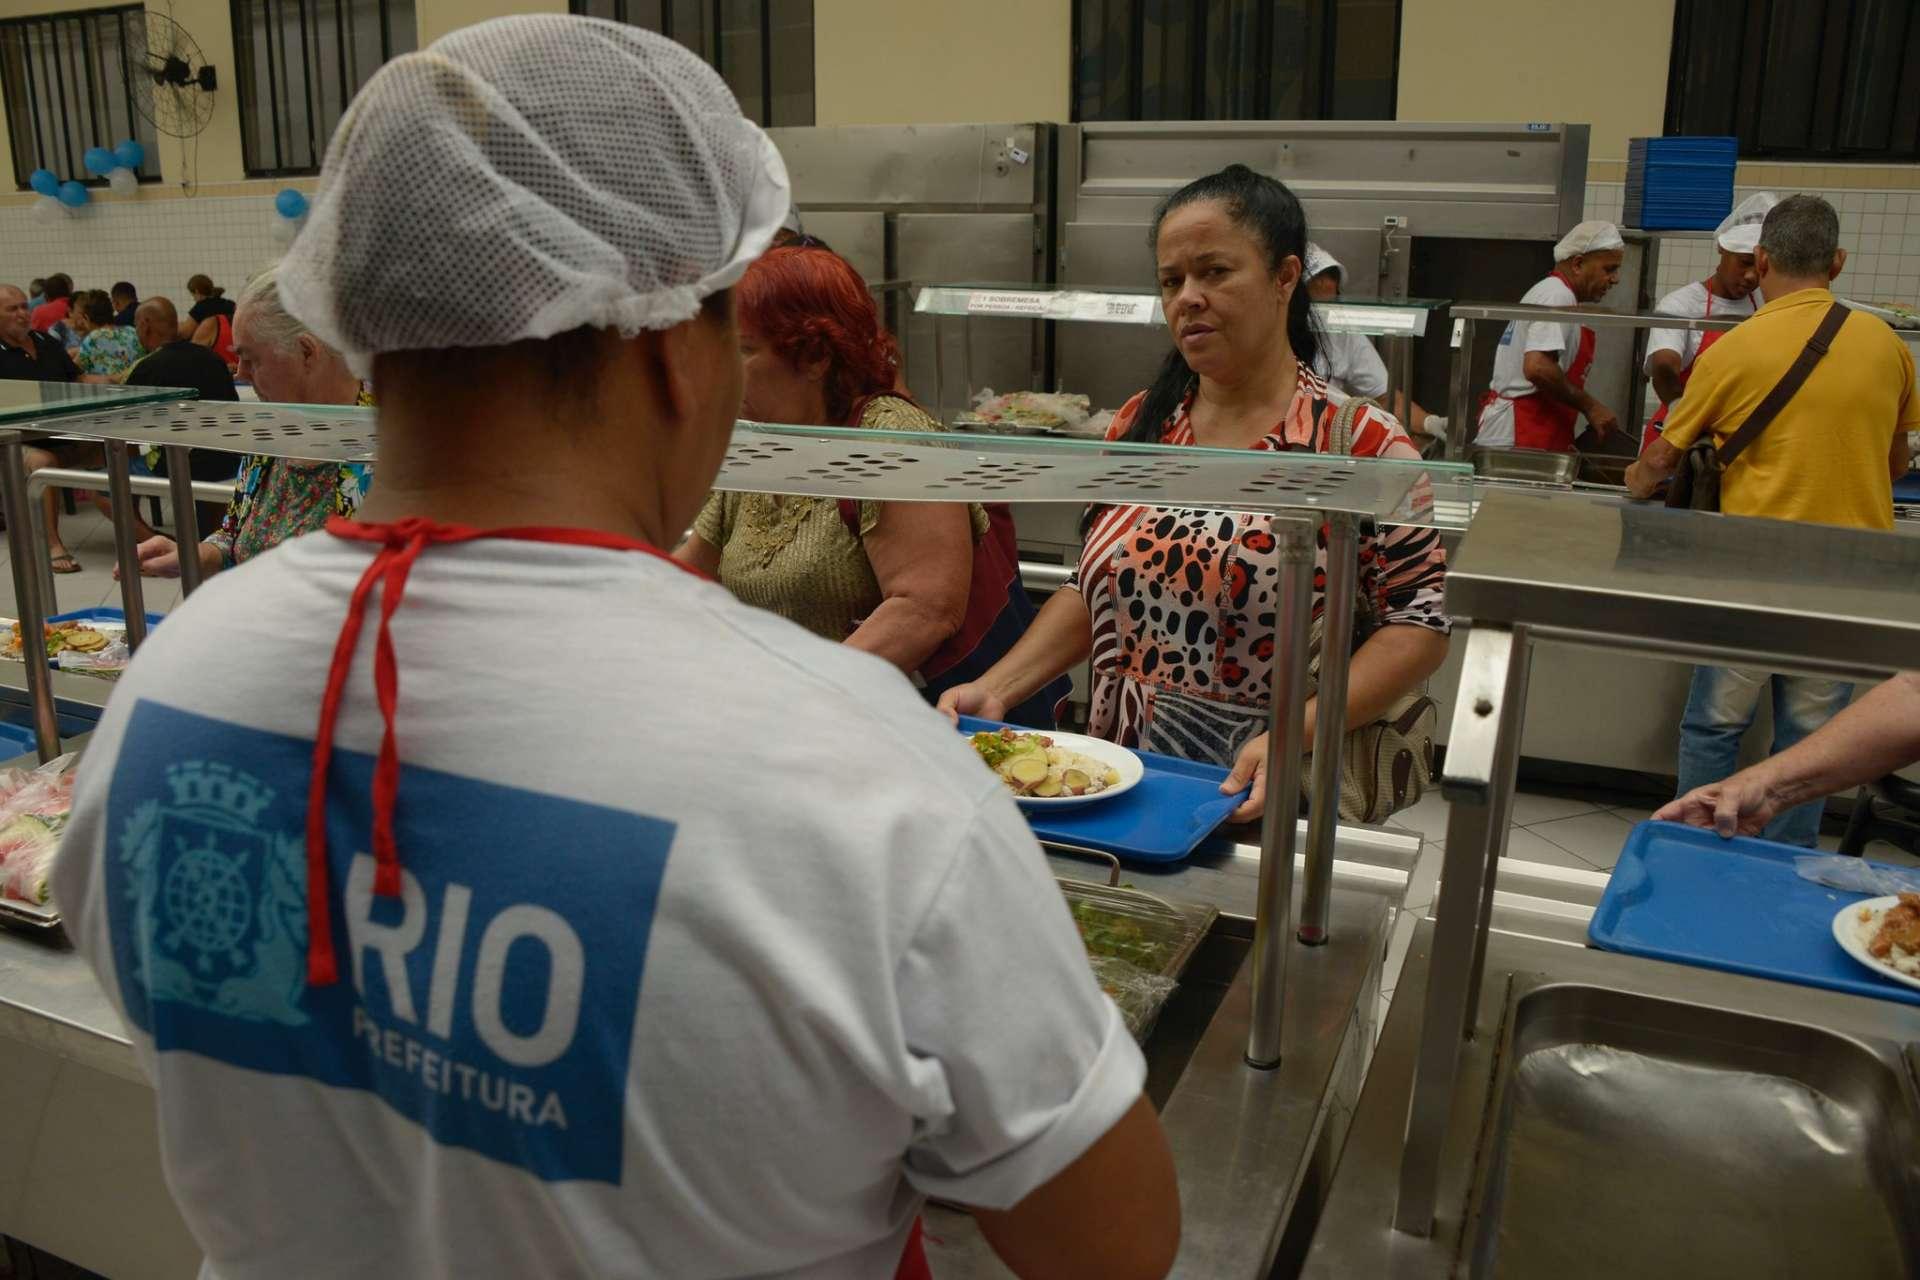 Programa dos Restaurantes Populares beneficia cidadãos diariamente. Foto: Marco Antônio Rezende / Prefeitura do Rio